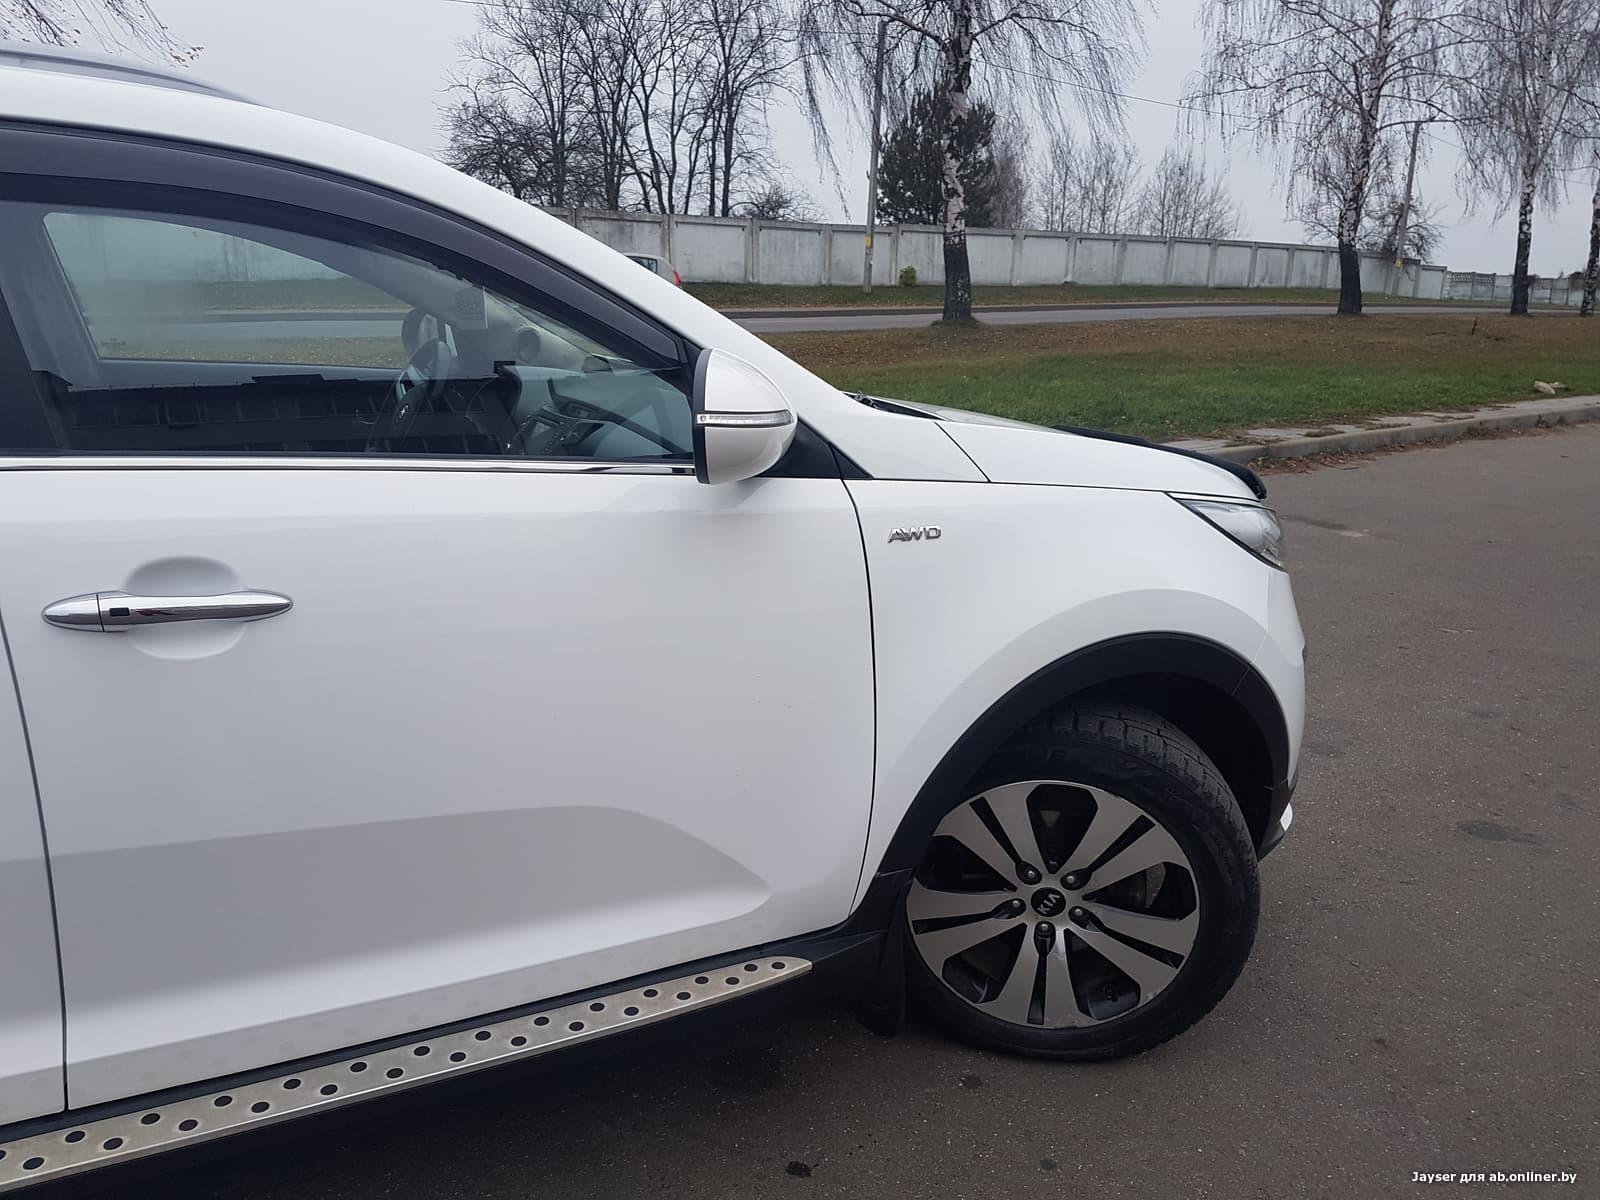 Kia Sportage 2.4 литра 177 л.с